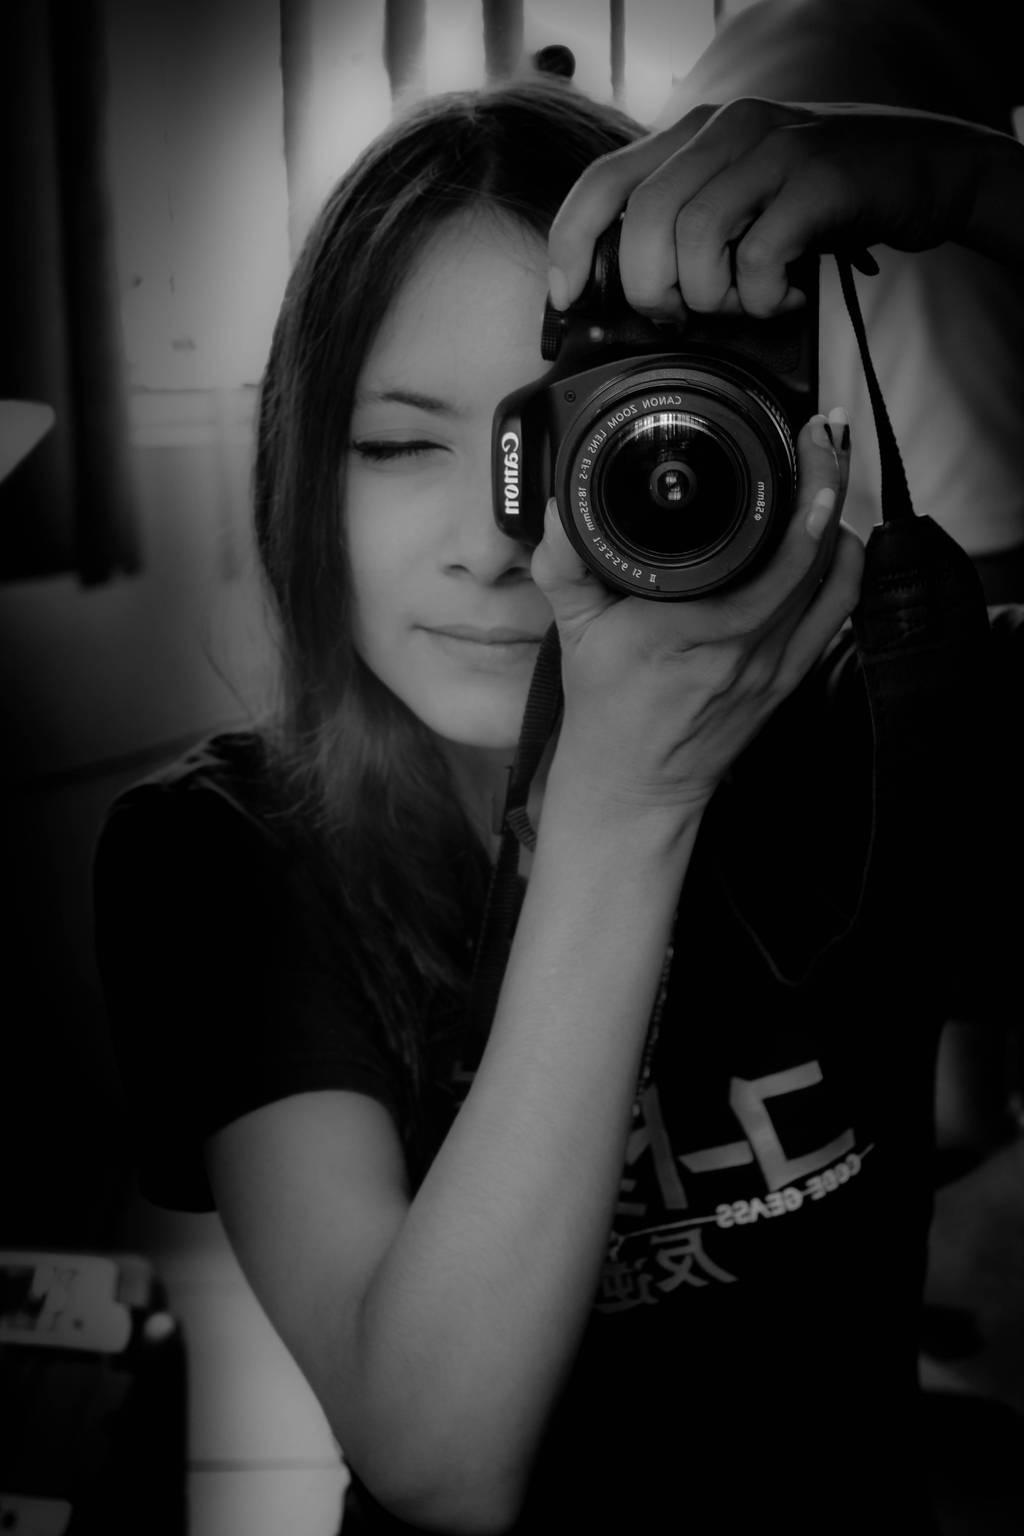 Karen--Kasumi's Profile Picture